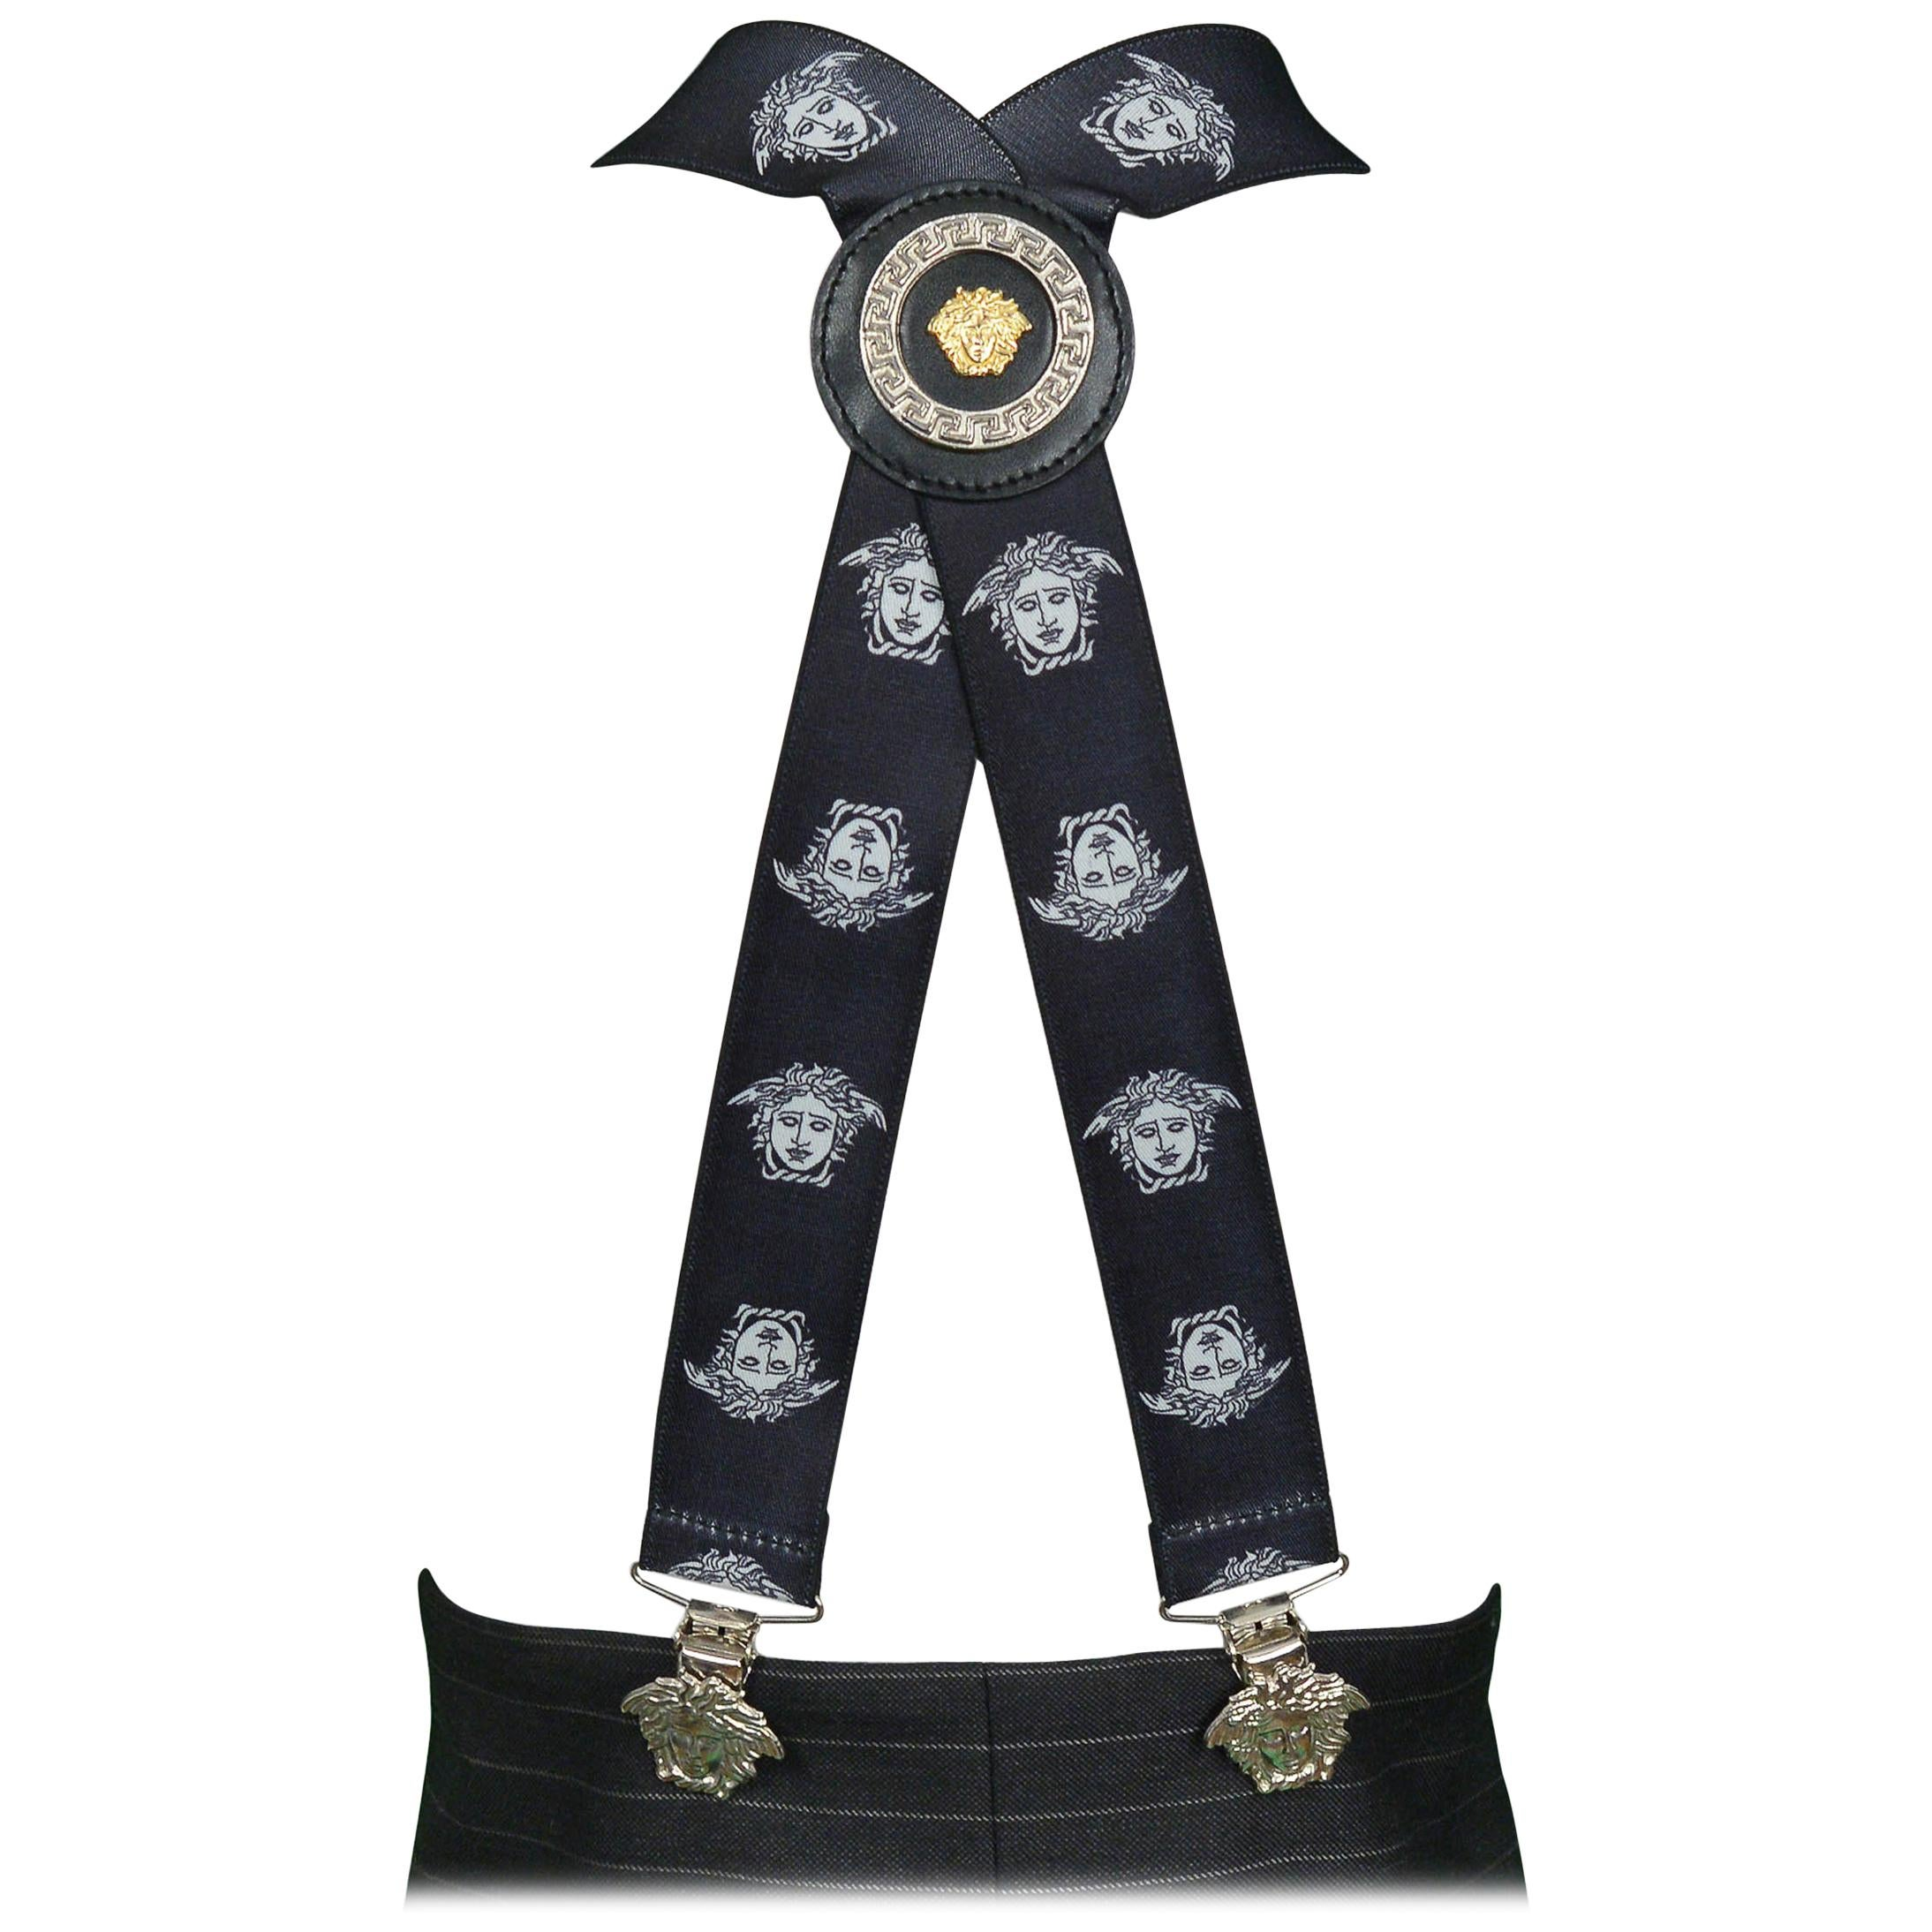 Vintage Versace Black & White Medusa Suspenders